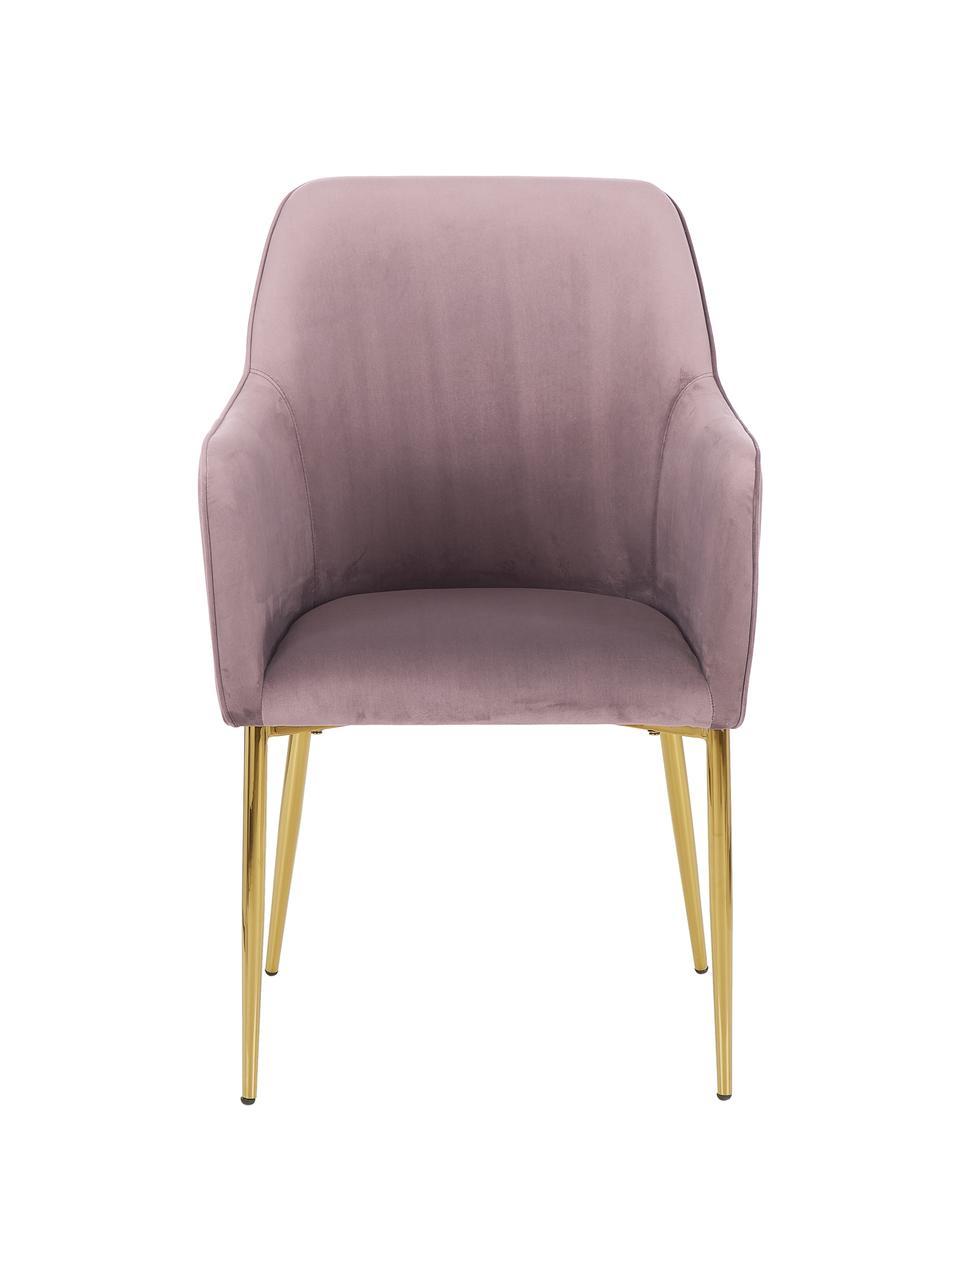 Samt-Armlehnstuhl Ava in Rosa, Bezug: Samt (100% Polyester) Der, Beine: Metall, galvanisiert, Samt Mauve, B 57 x T 63 cm